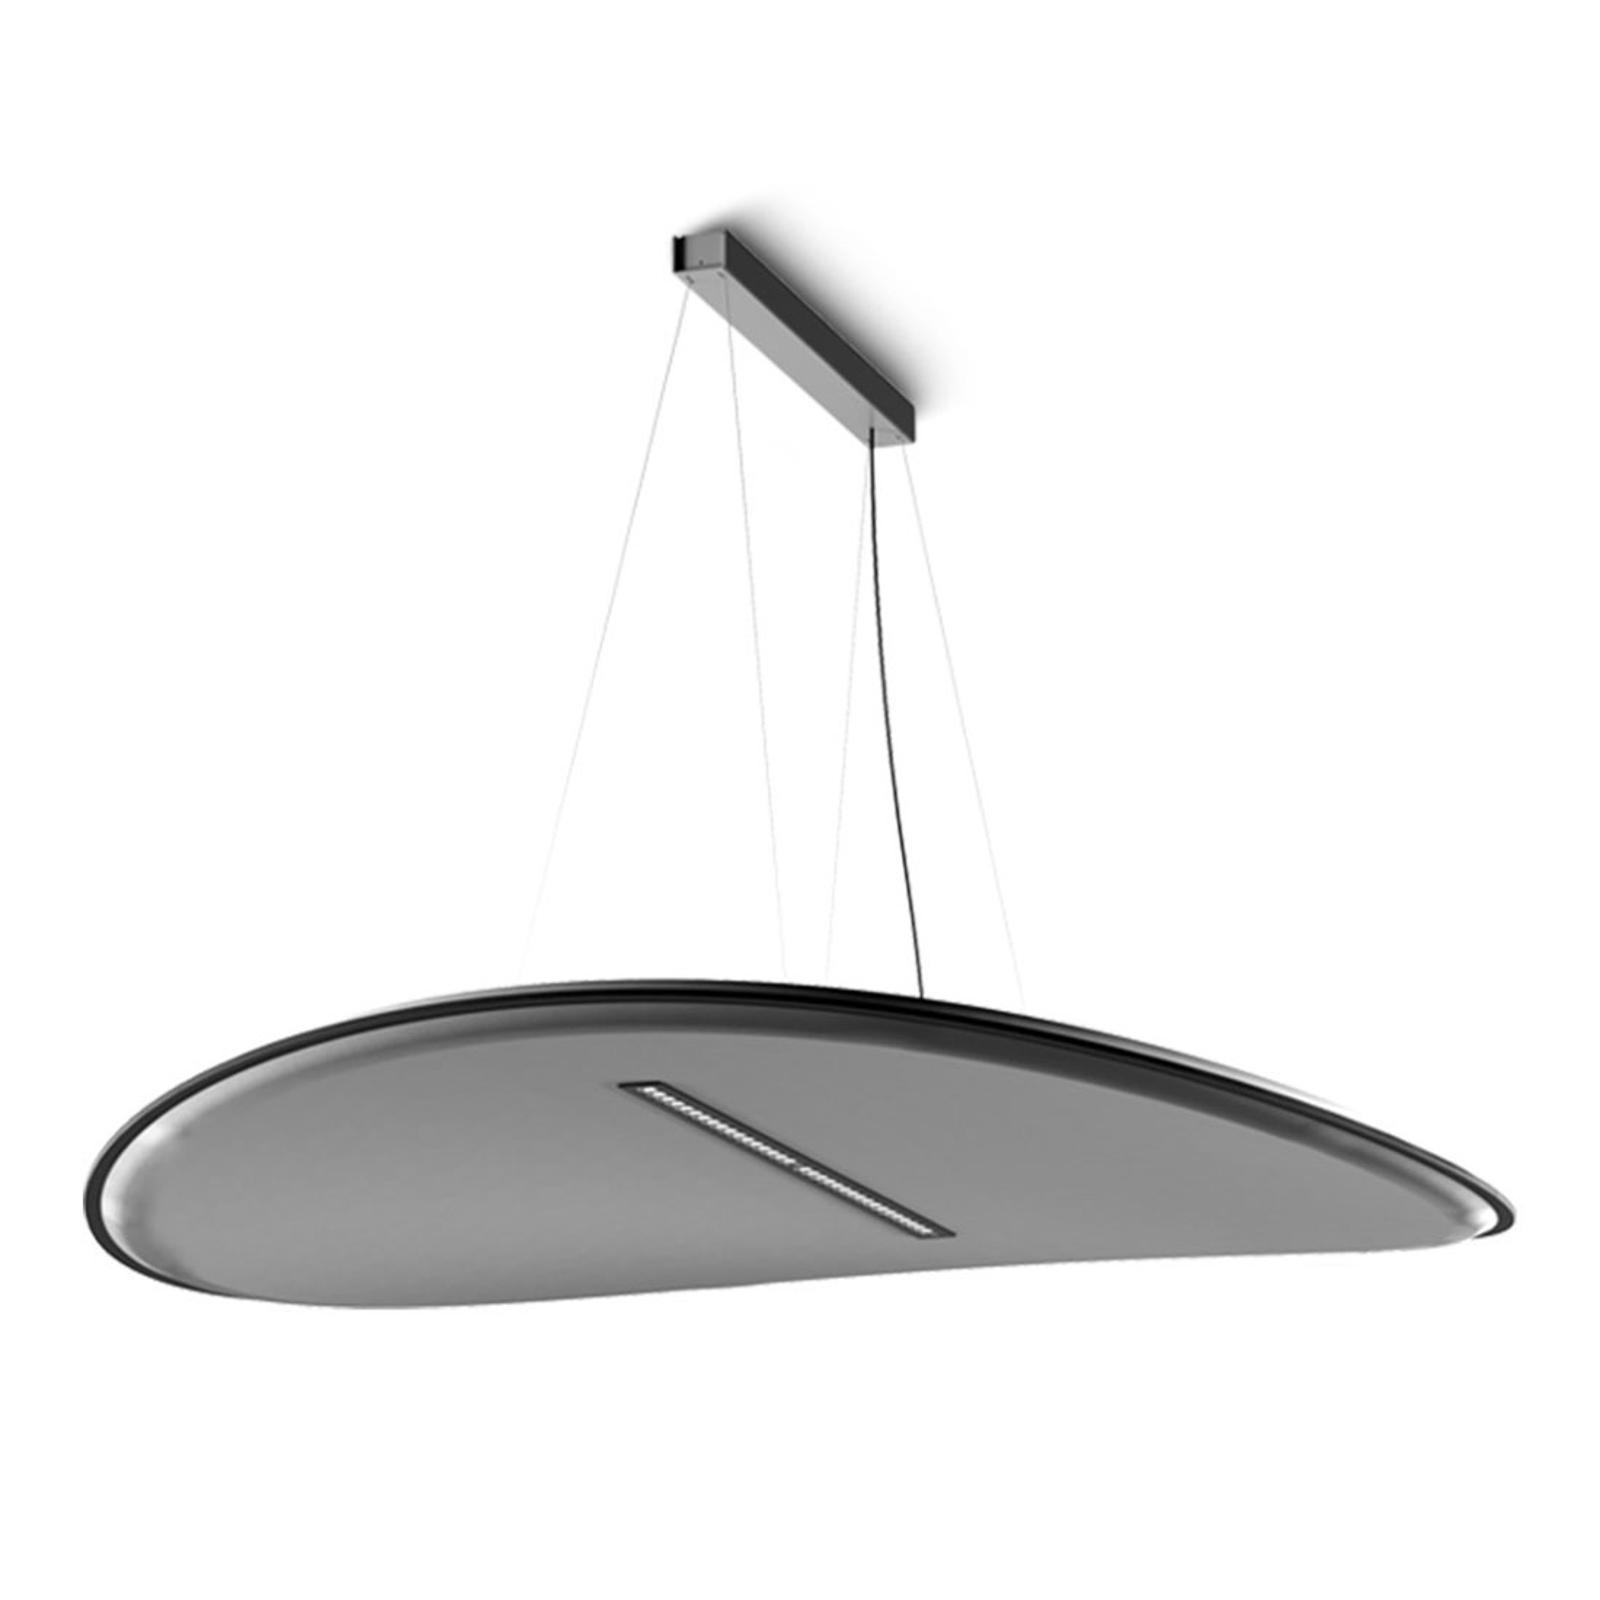 LED hanglamp Derby met darklight-filter